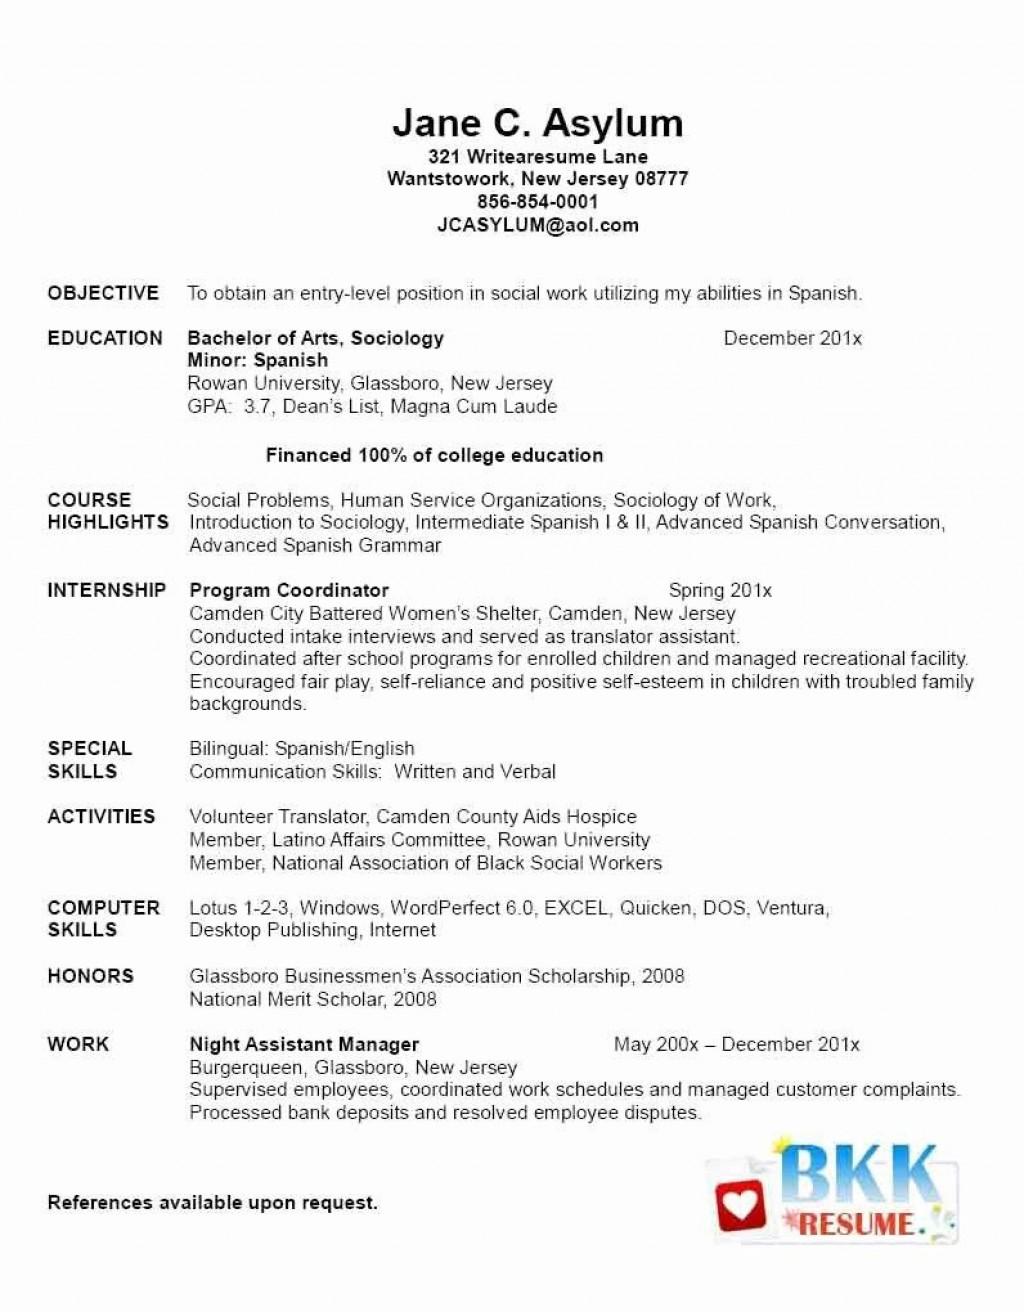 002 Incredible Grad School Resume Template Inspiration  Application Cv Graduate For AdmissionLarge